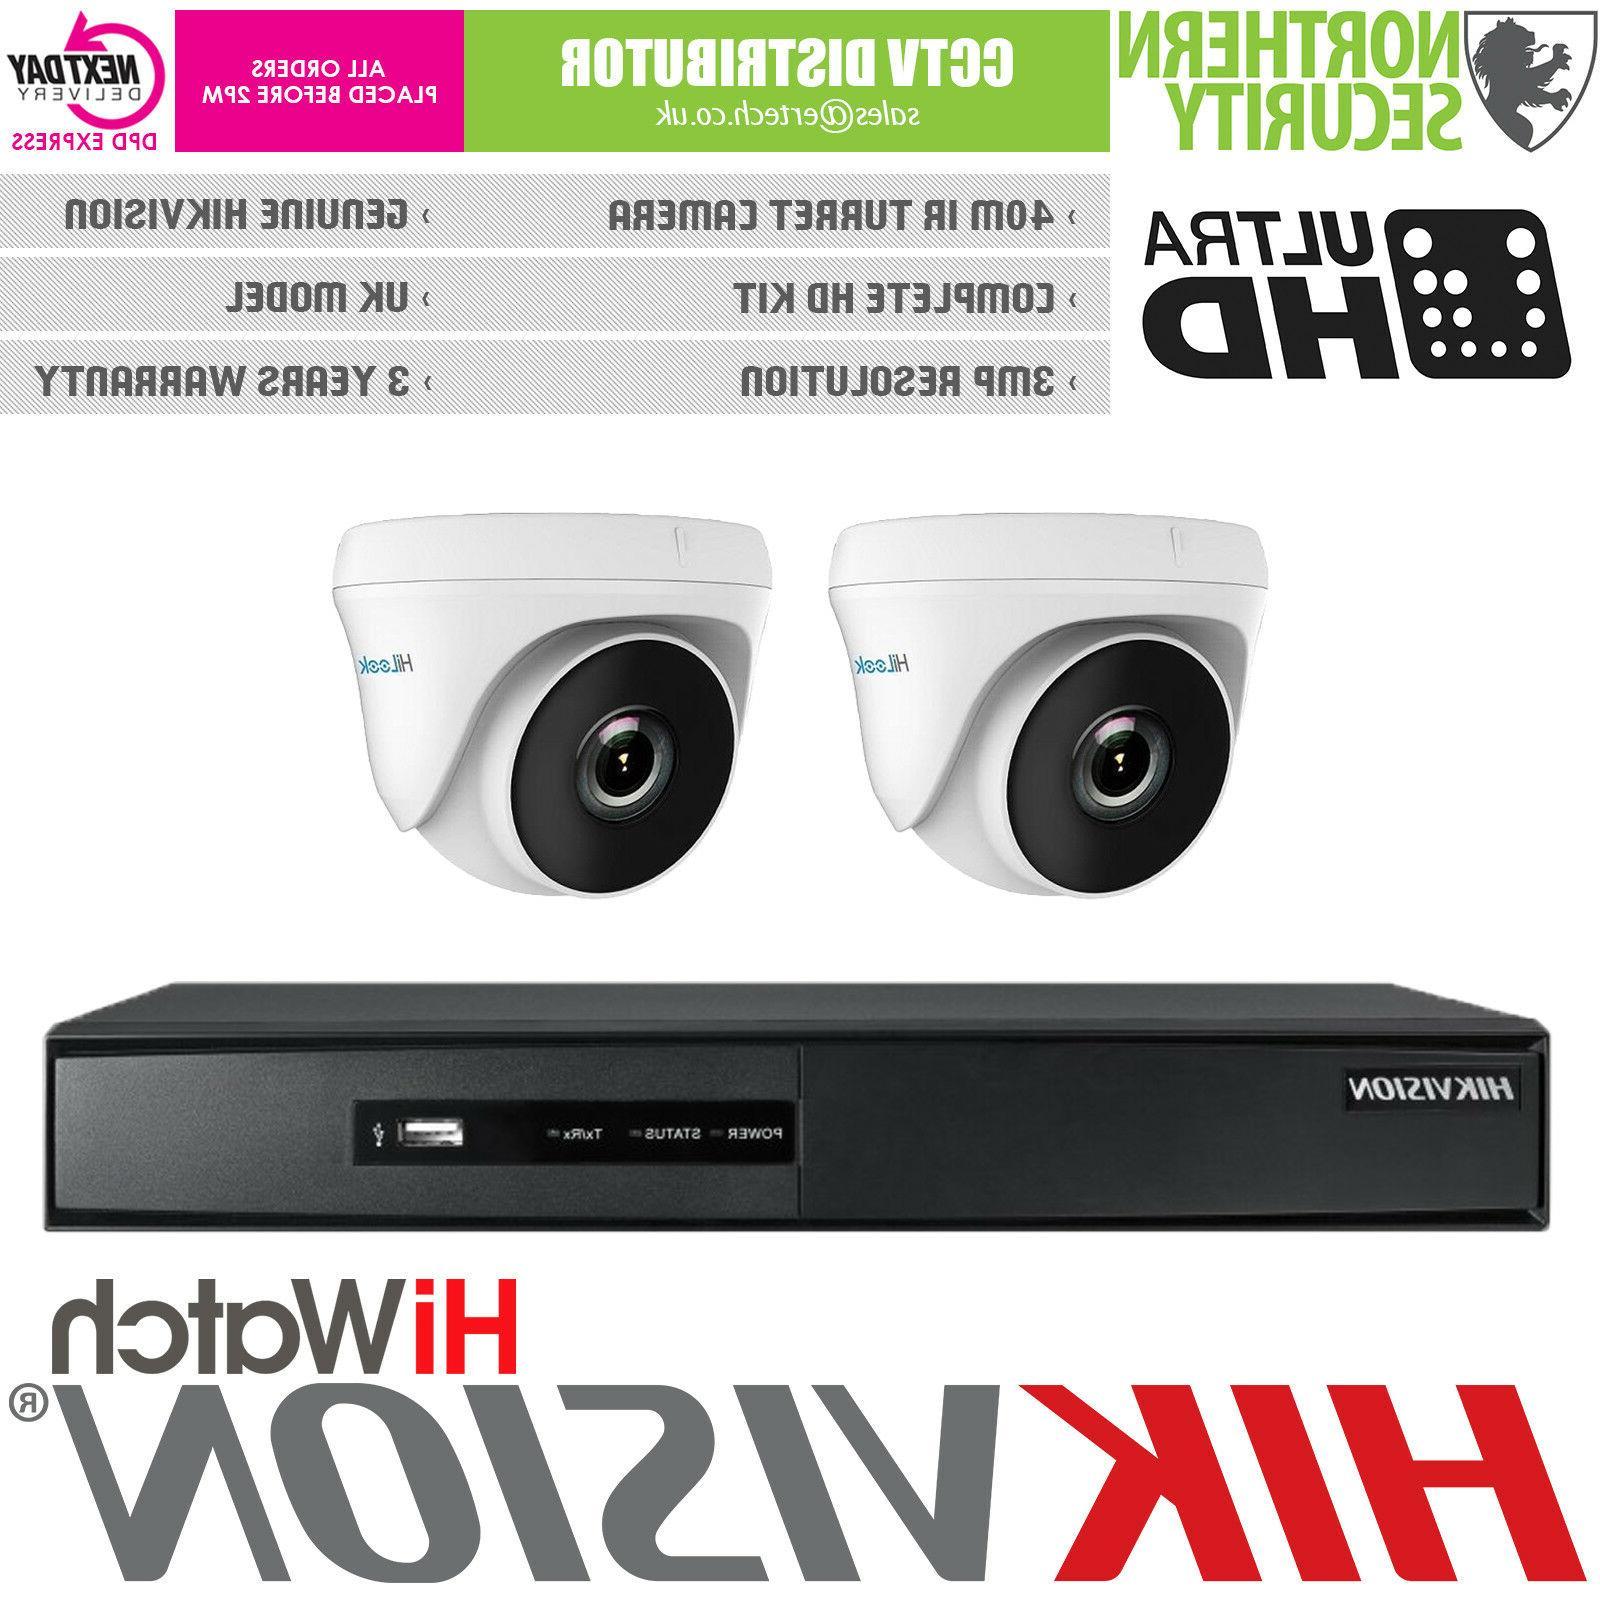 Hikvision 2 4 8 3MP IP67 40M Alarm DVR Home Kit